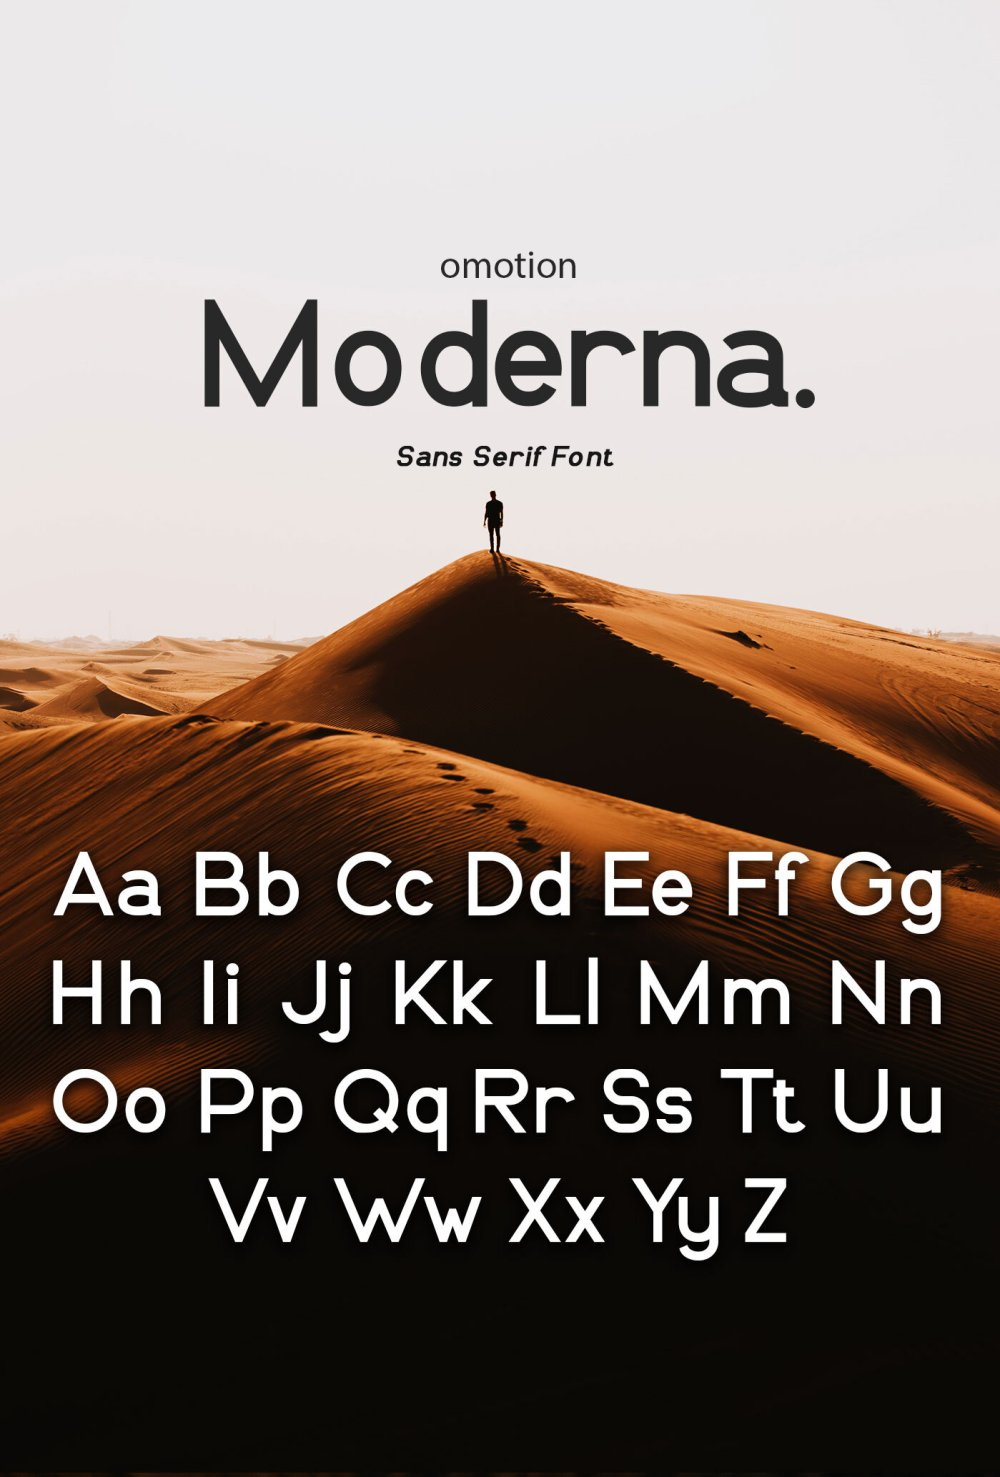 omotion Classi - Free serif font